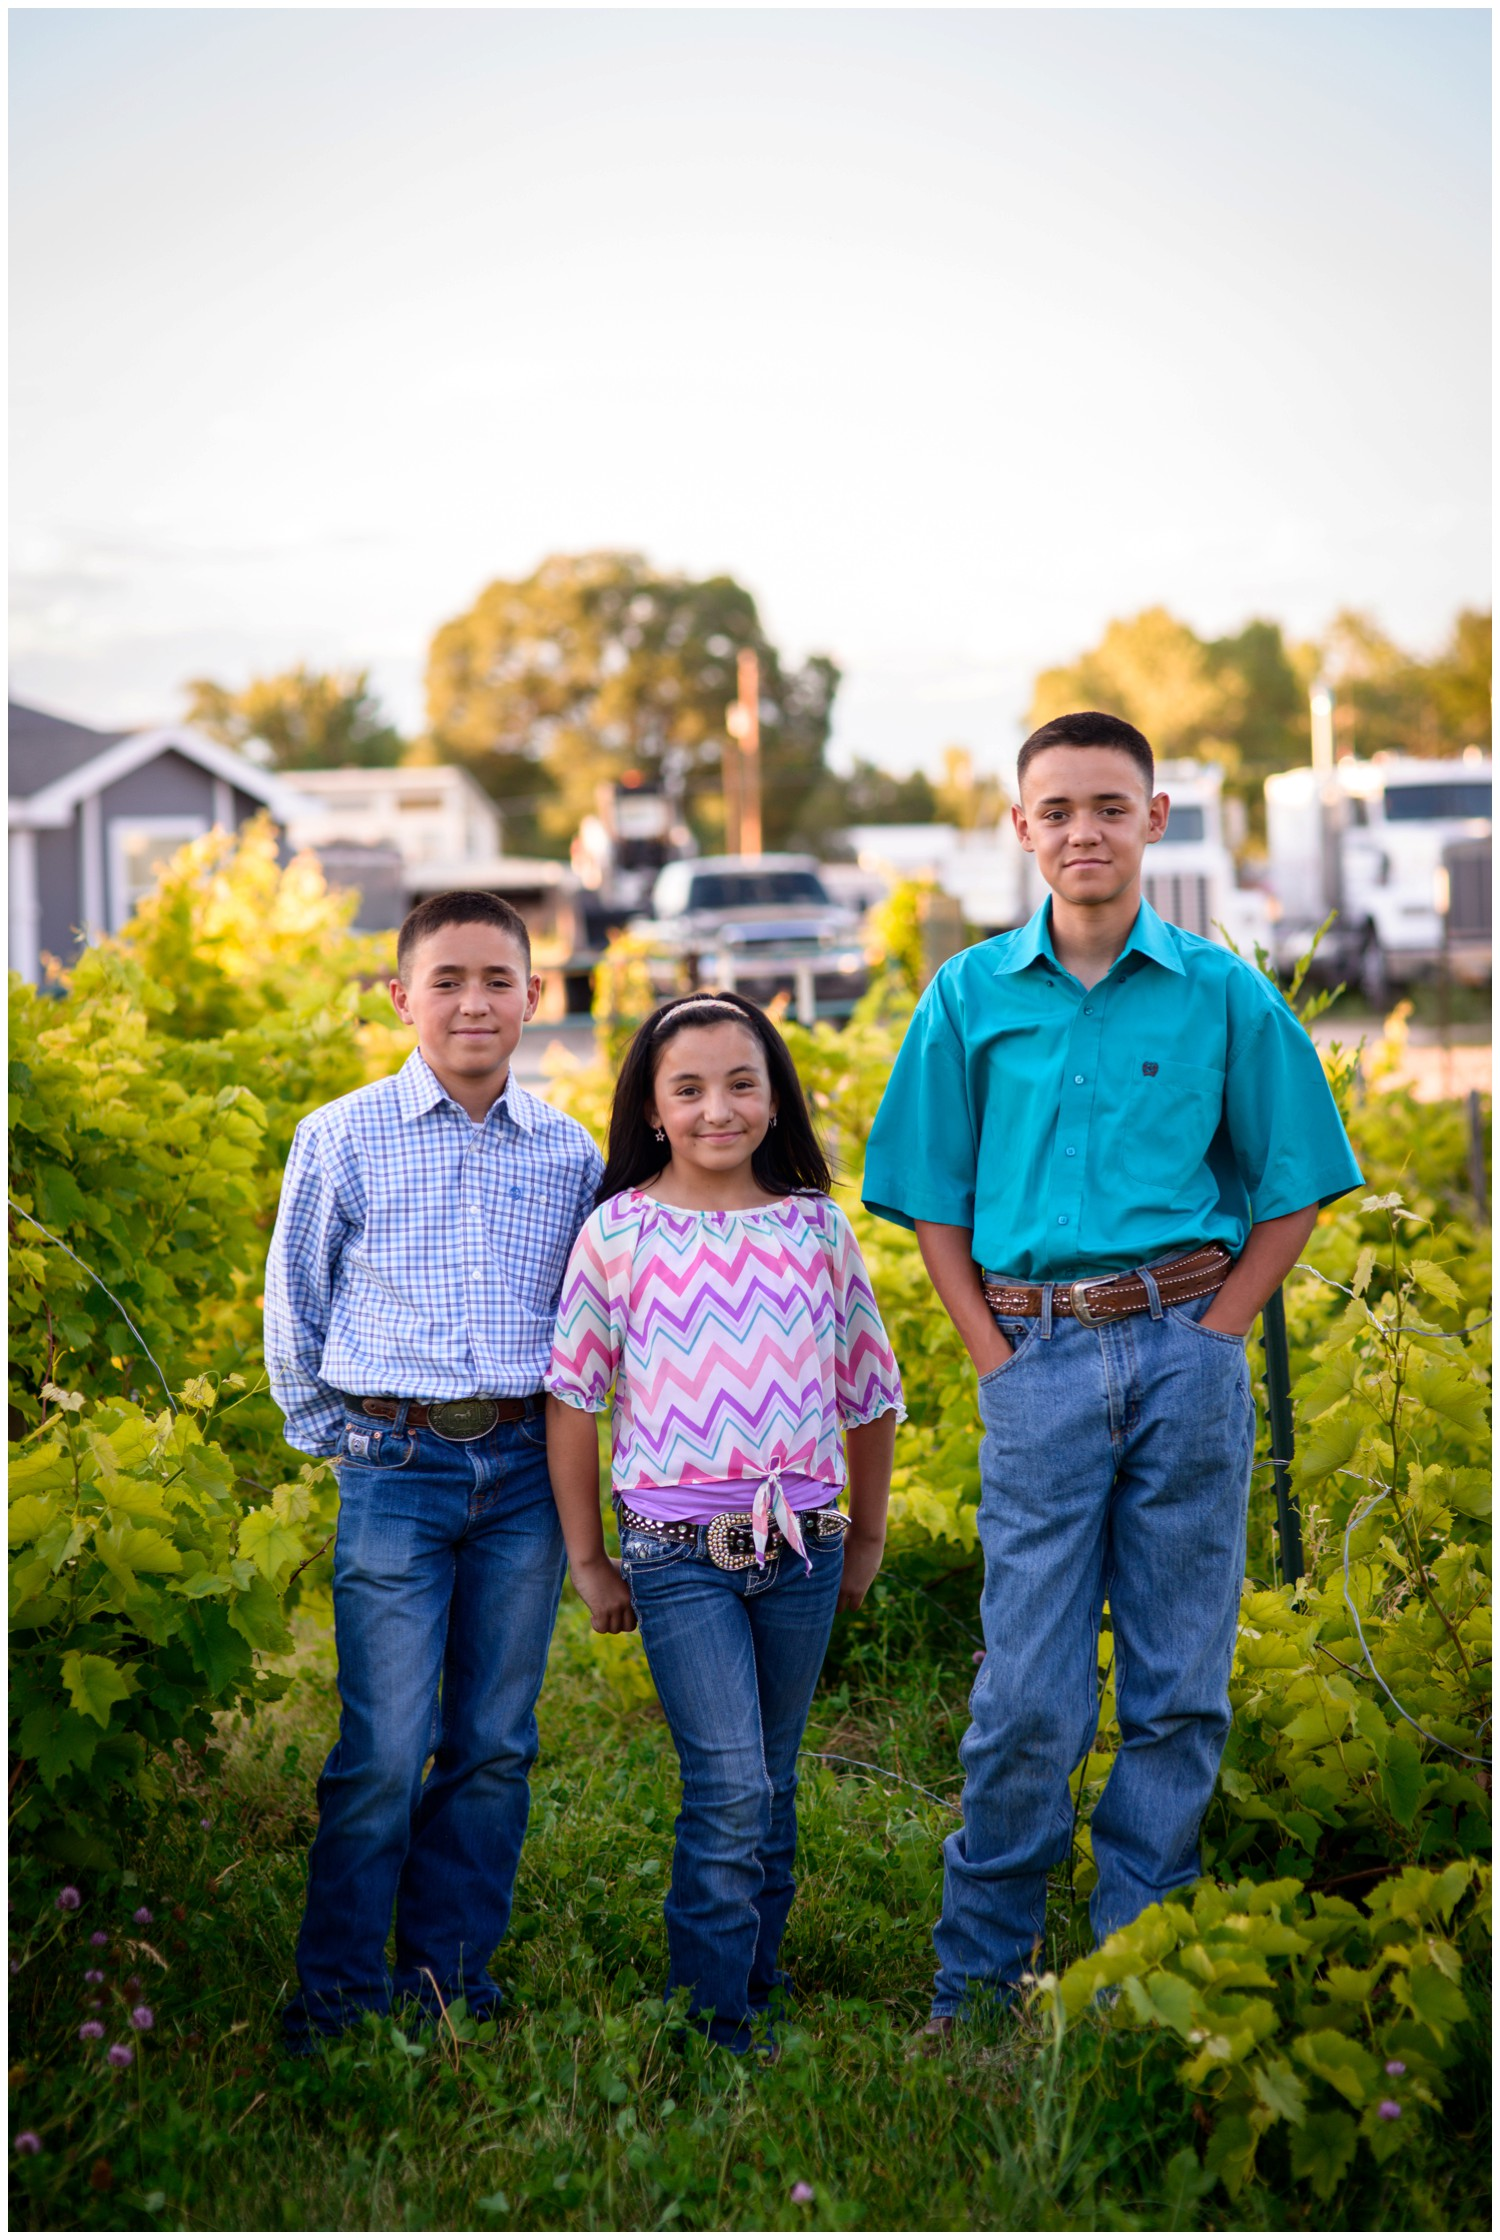 Colorado-lifestyle-farm-family-photography_0036.jpg